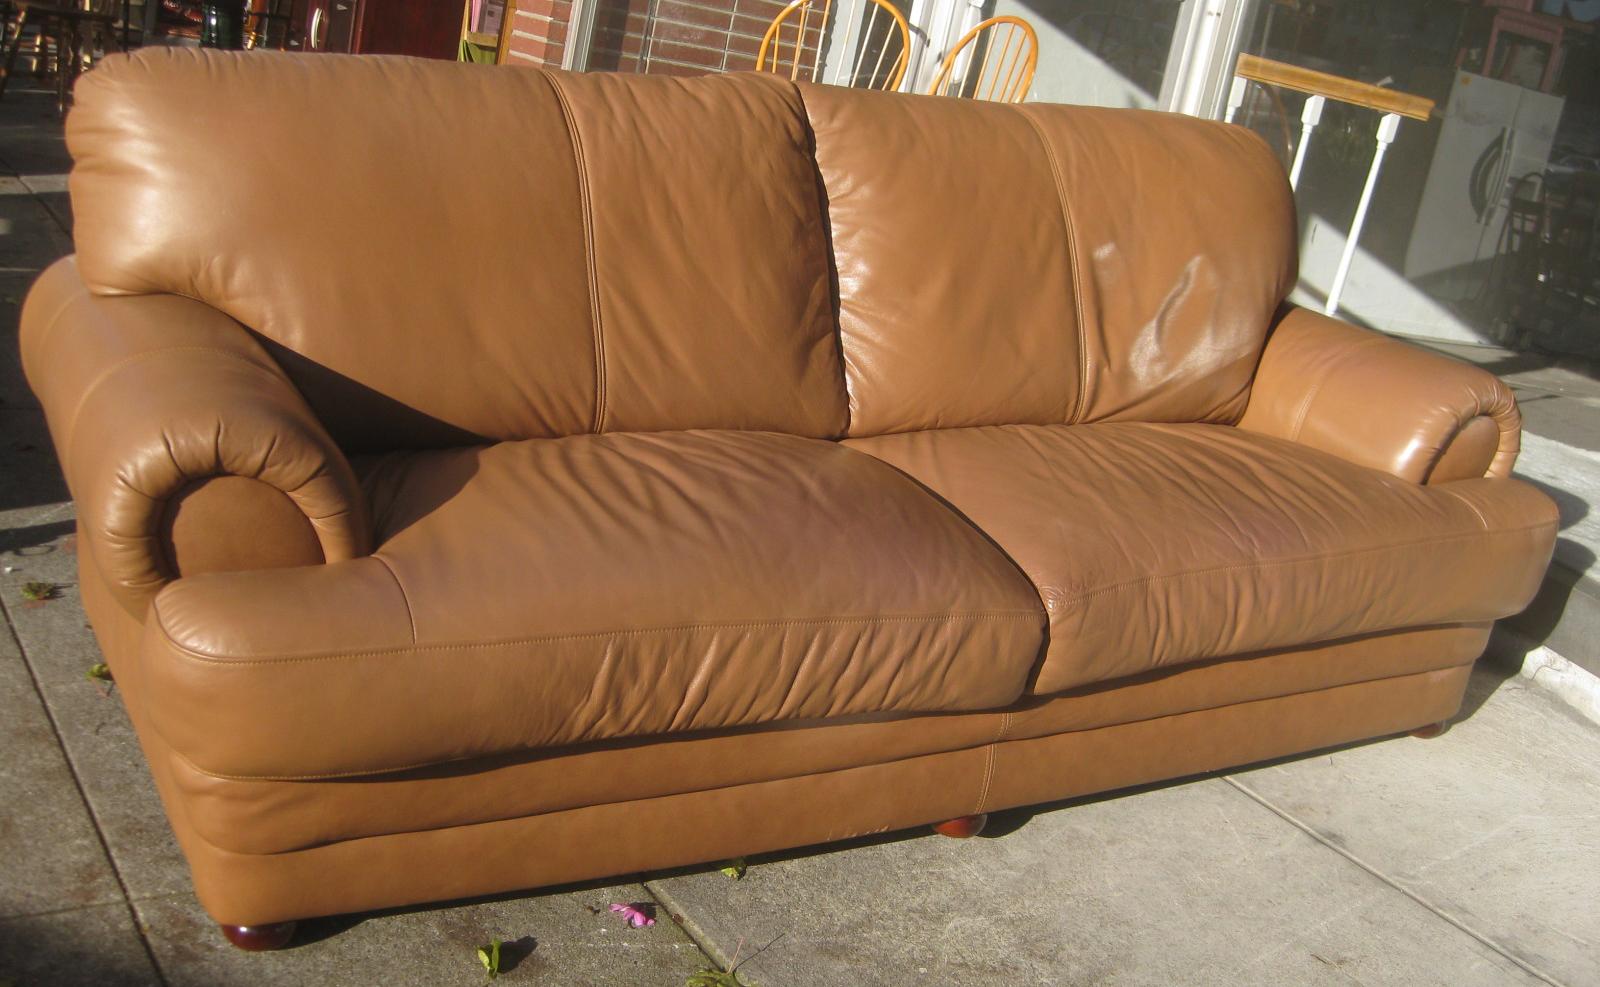 Uhuru Furniture Collectibles Sold Tan Soft Leather Sofa 200